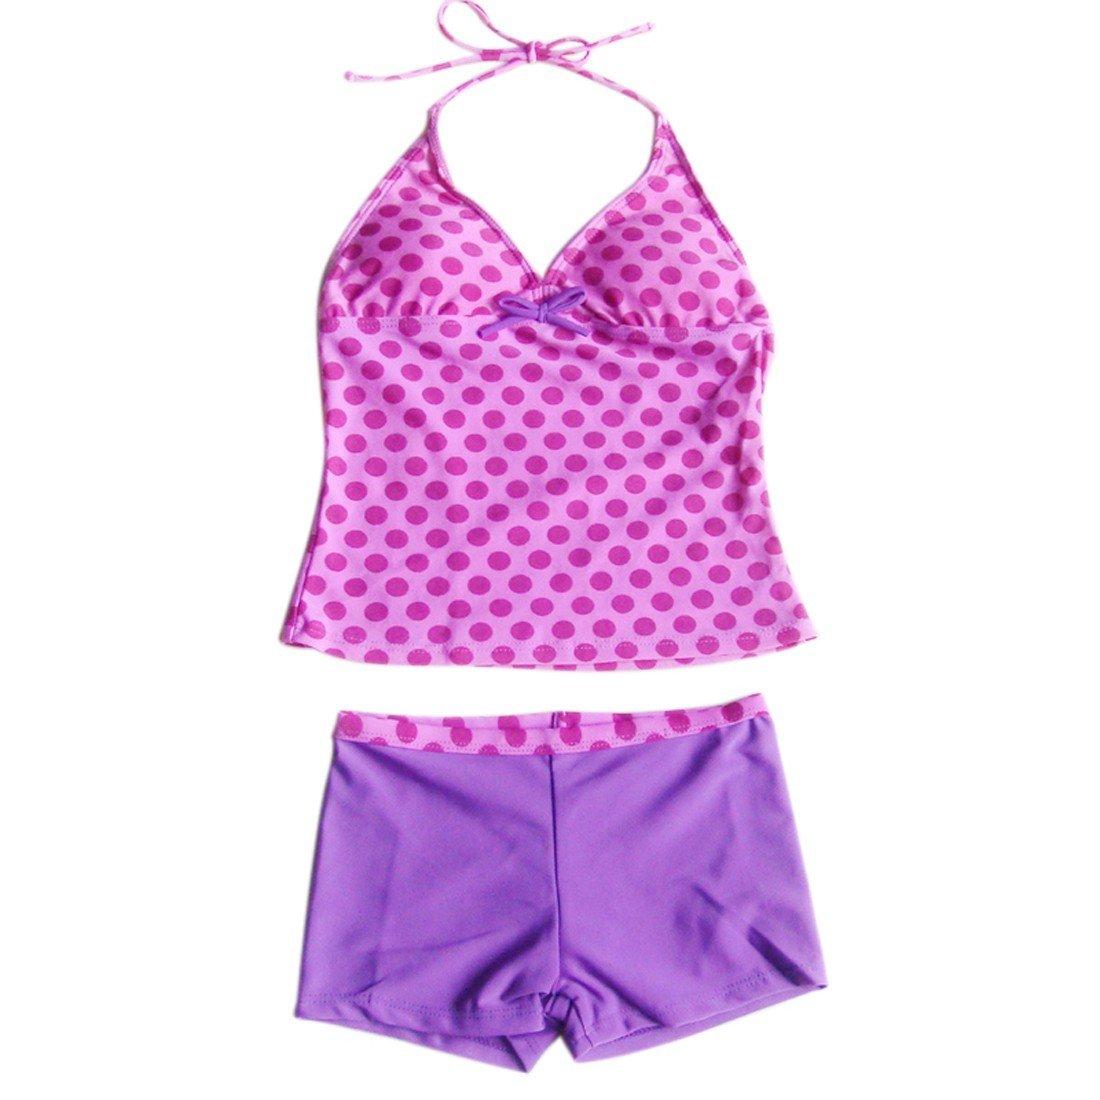 TiaoBug Girls Halter Polka Dots Summer Beach Tankini Swimwear Swimsuit Purple 9-10